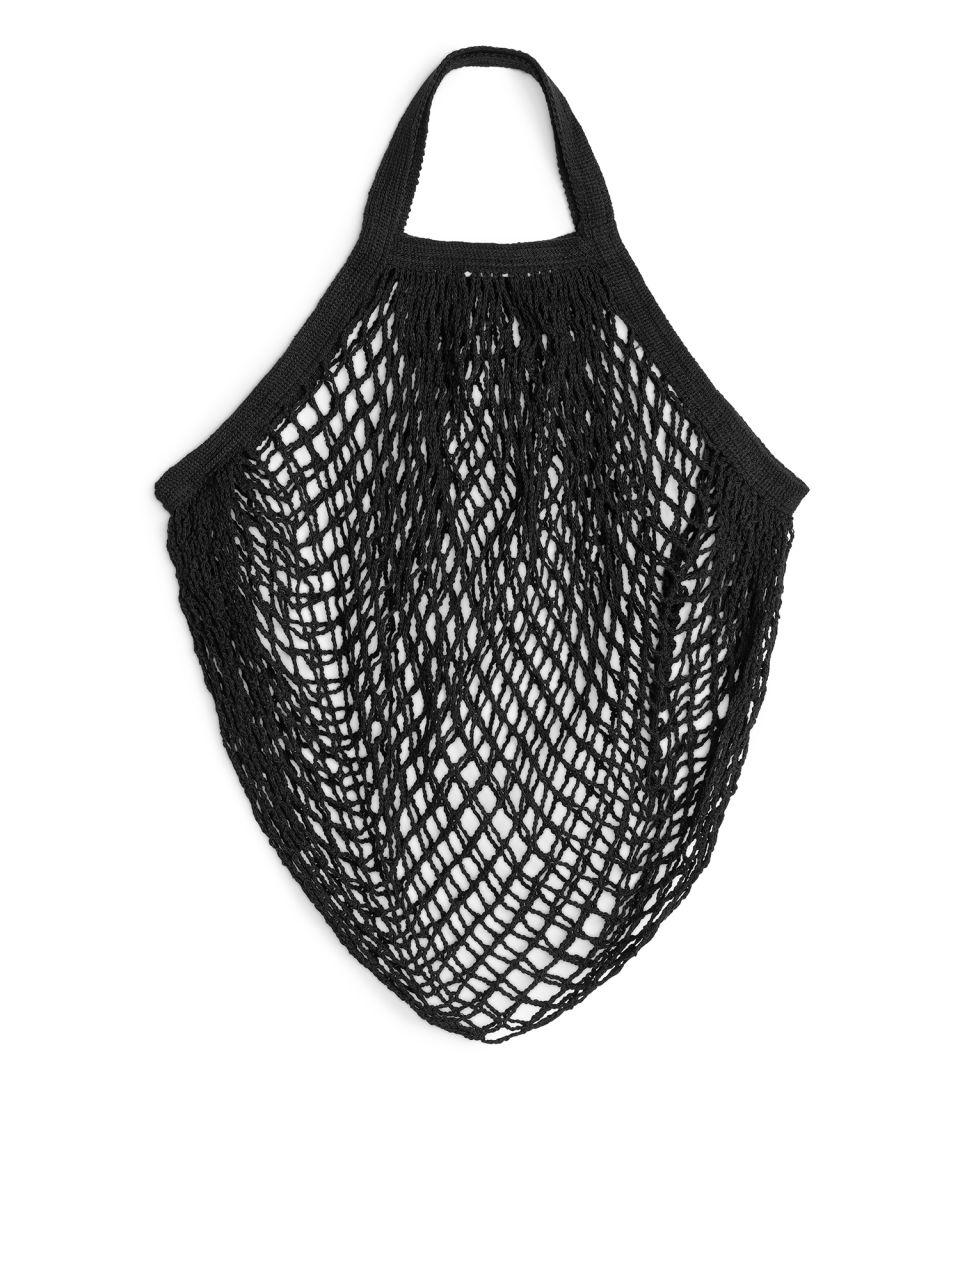 Turtle Bags String Bag - Black